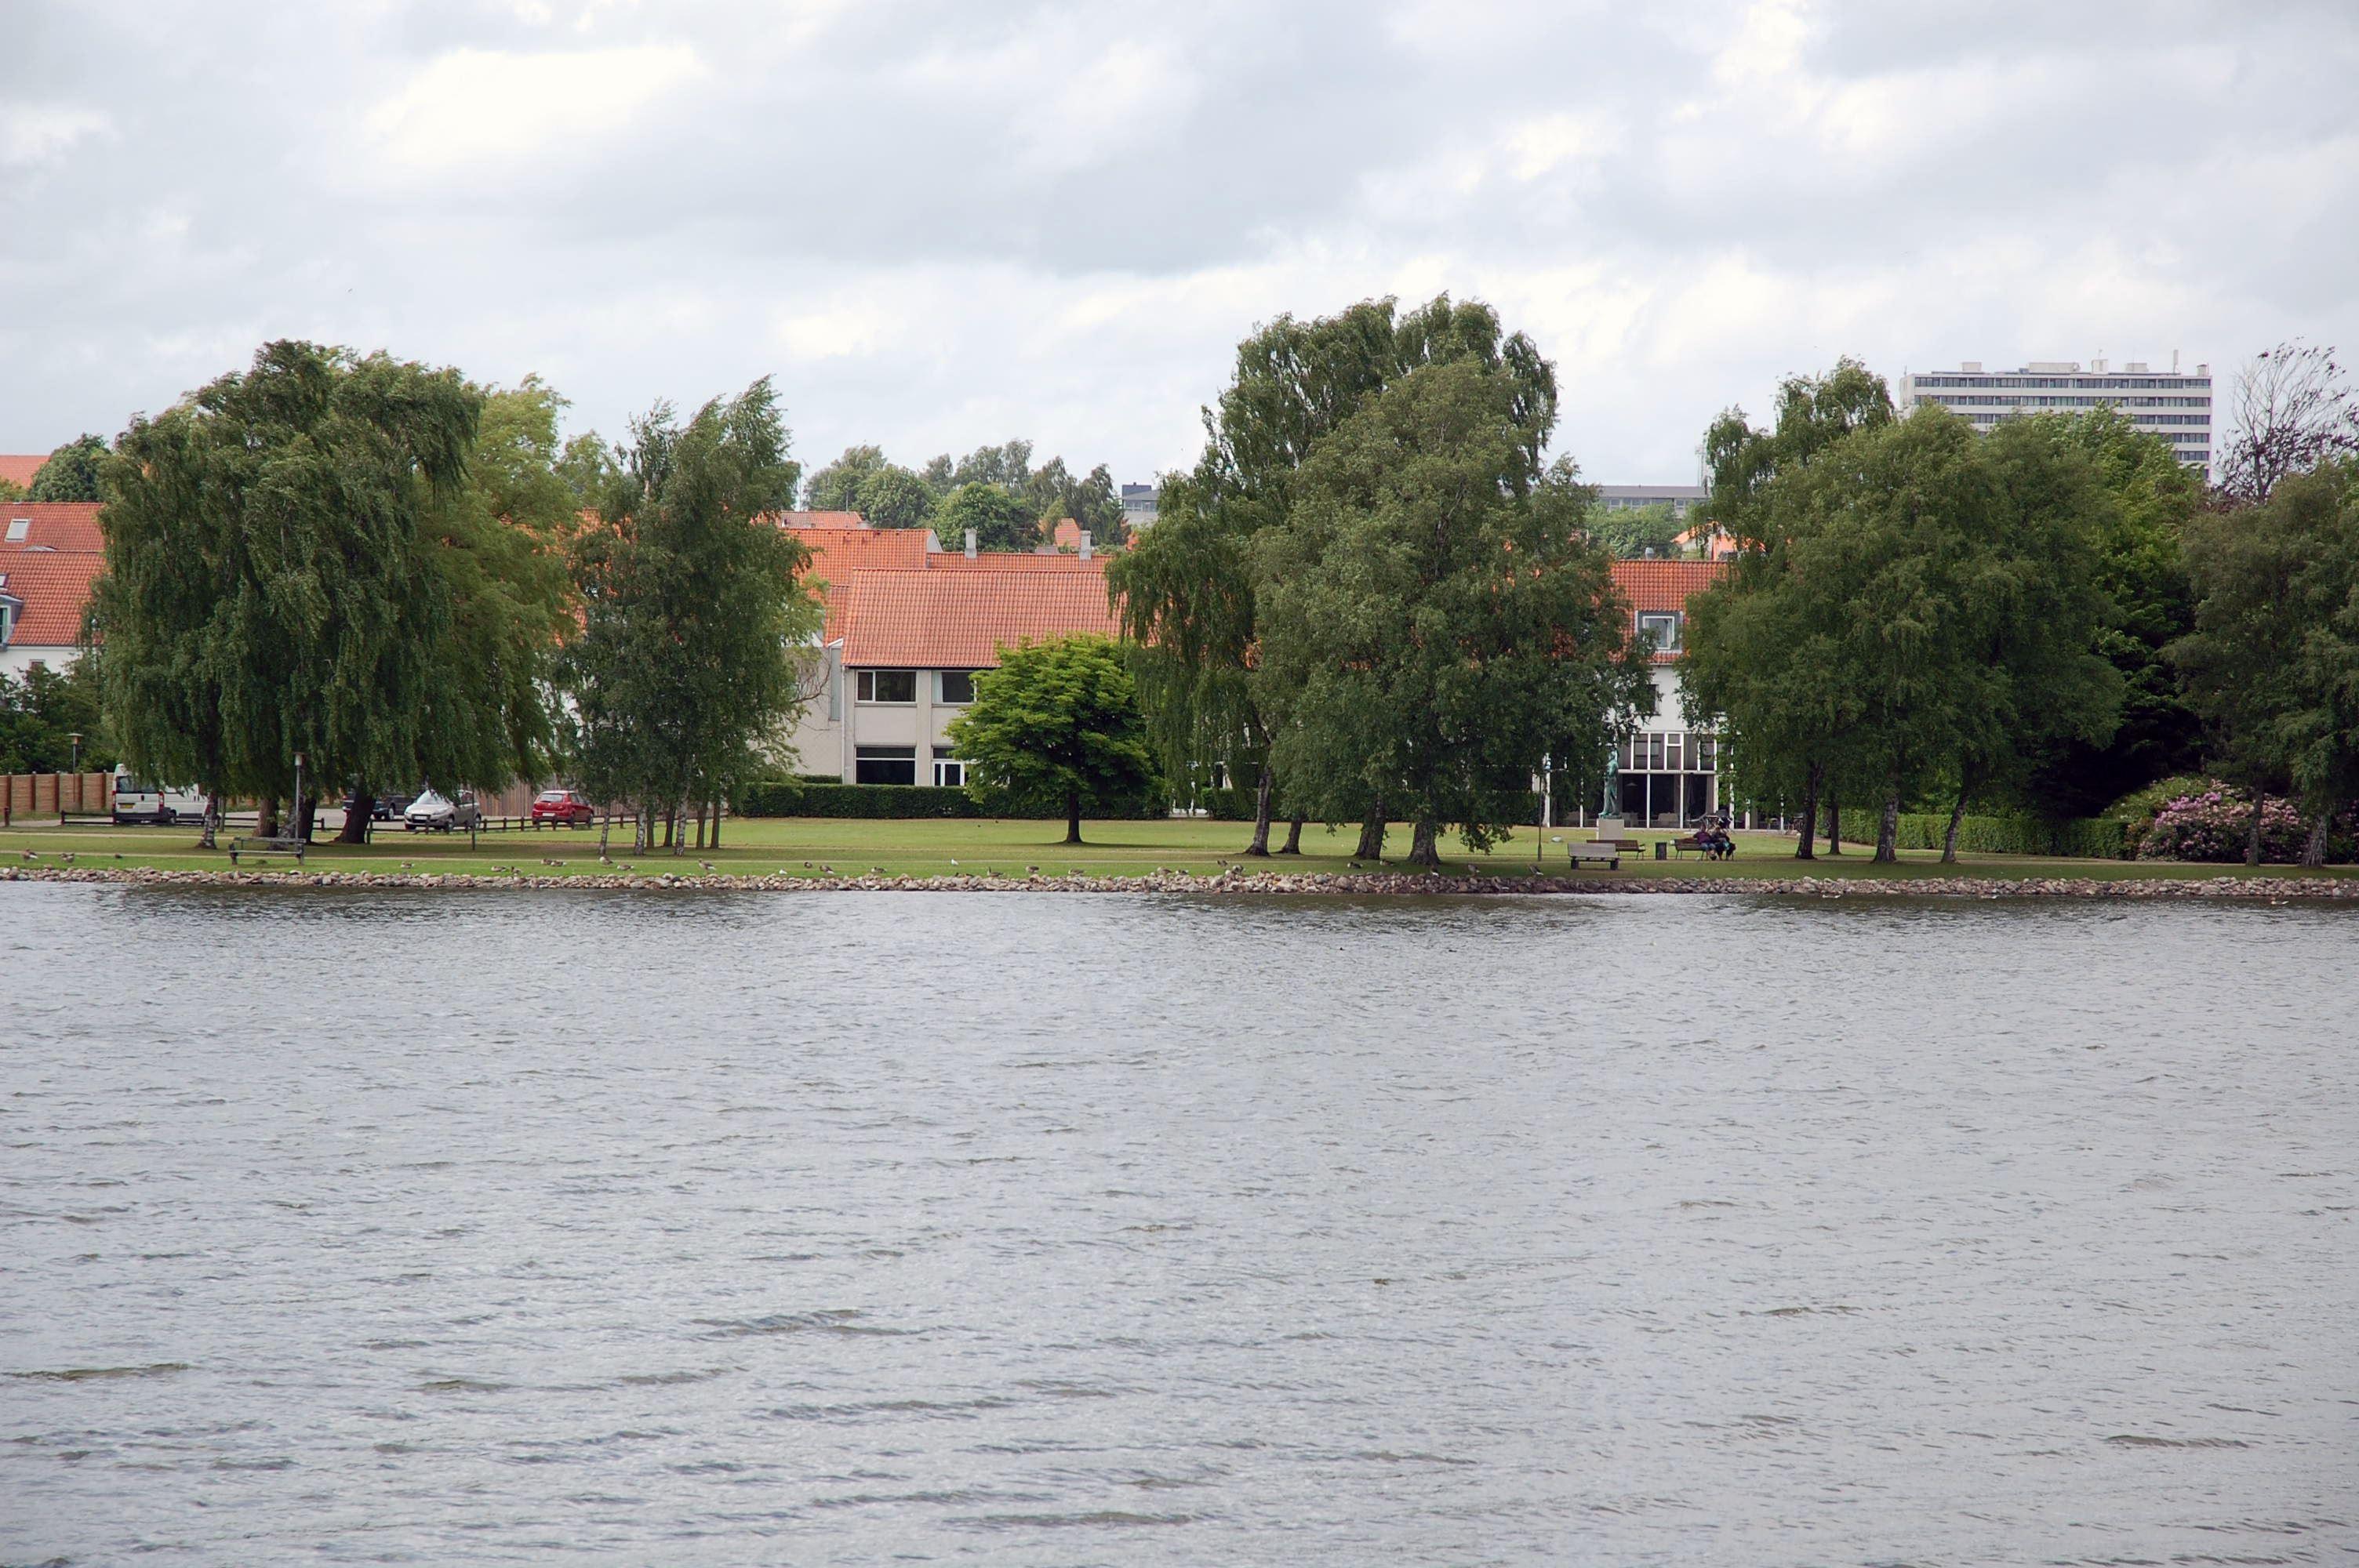 Hotel Norden, Haderslev